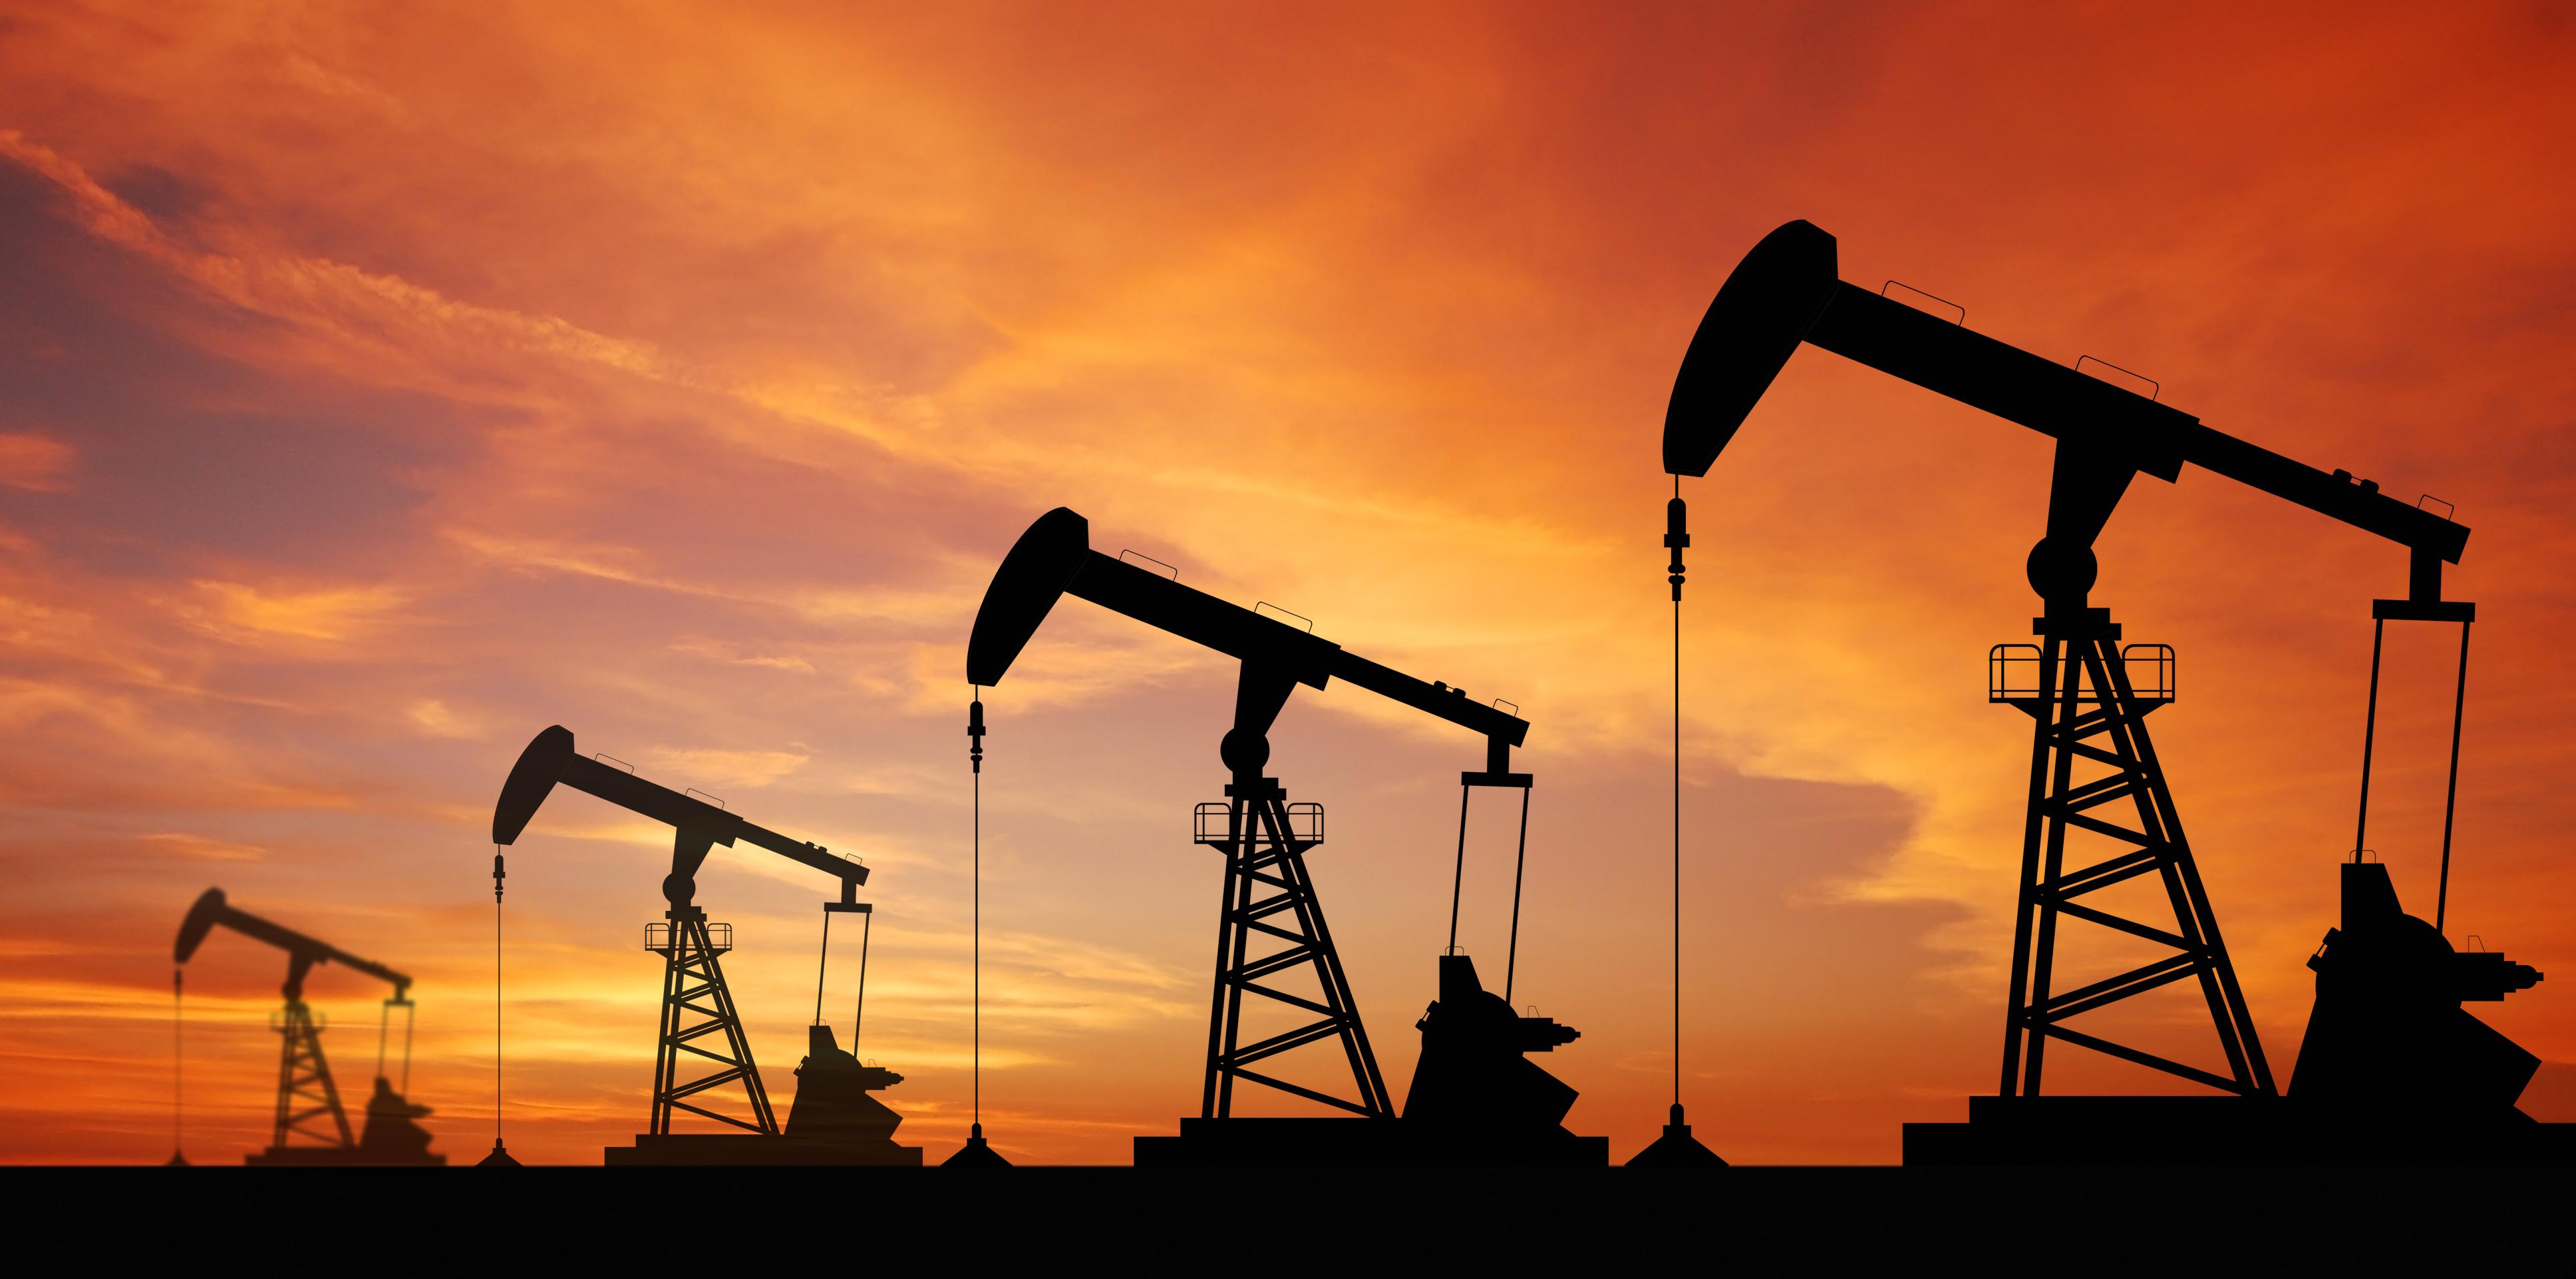 State-owned Albpetrol to take back two oil zones from TransAtlantic Albania